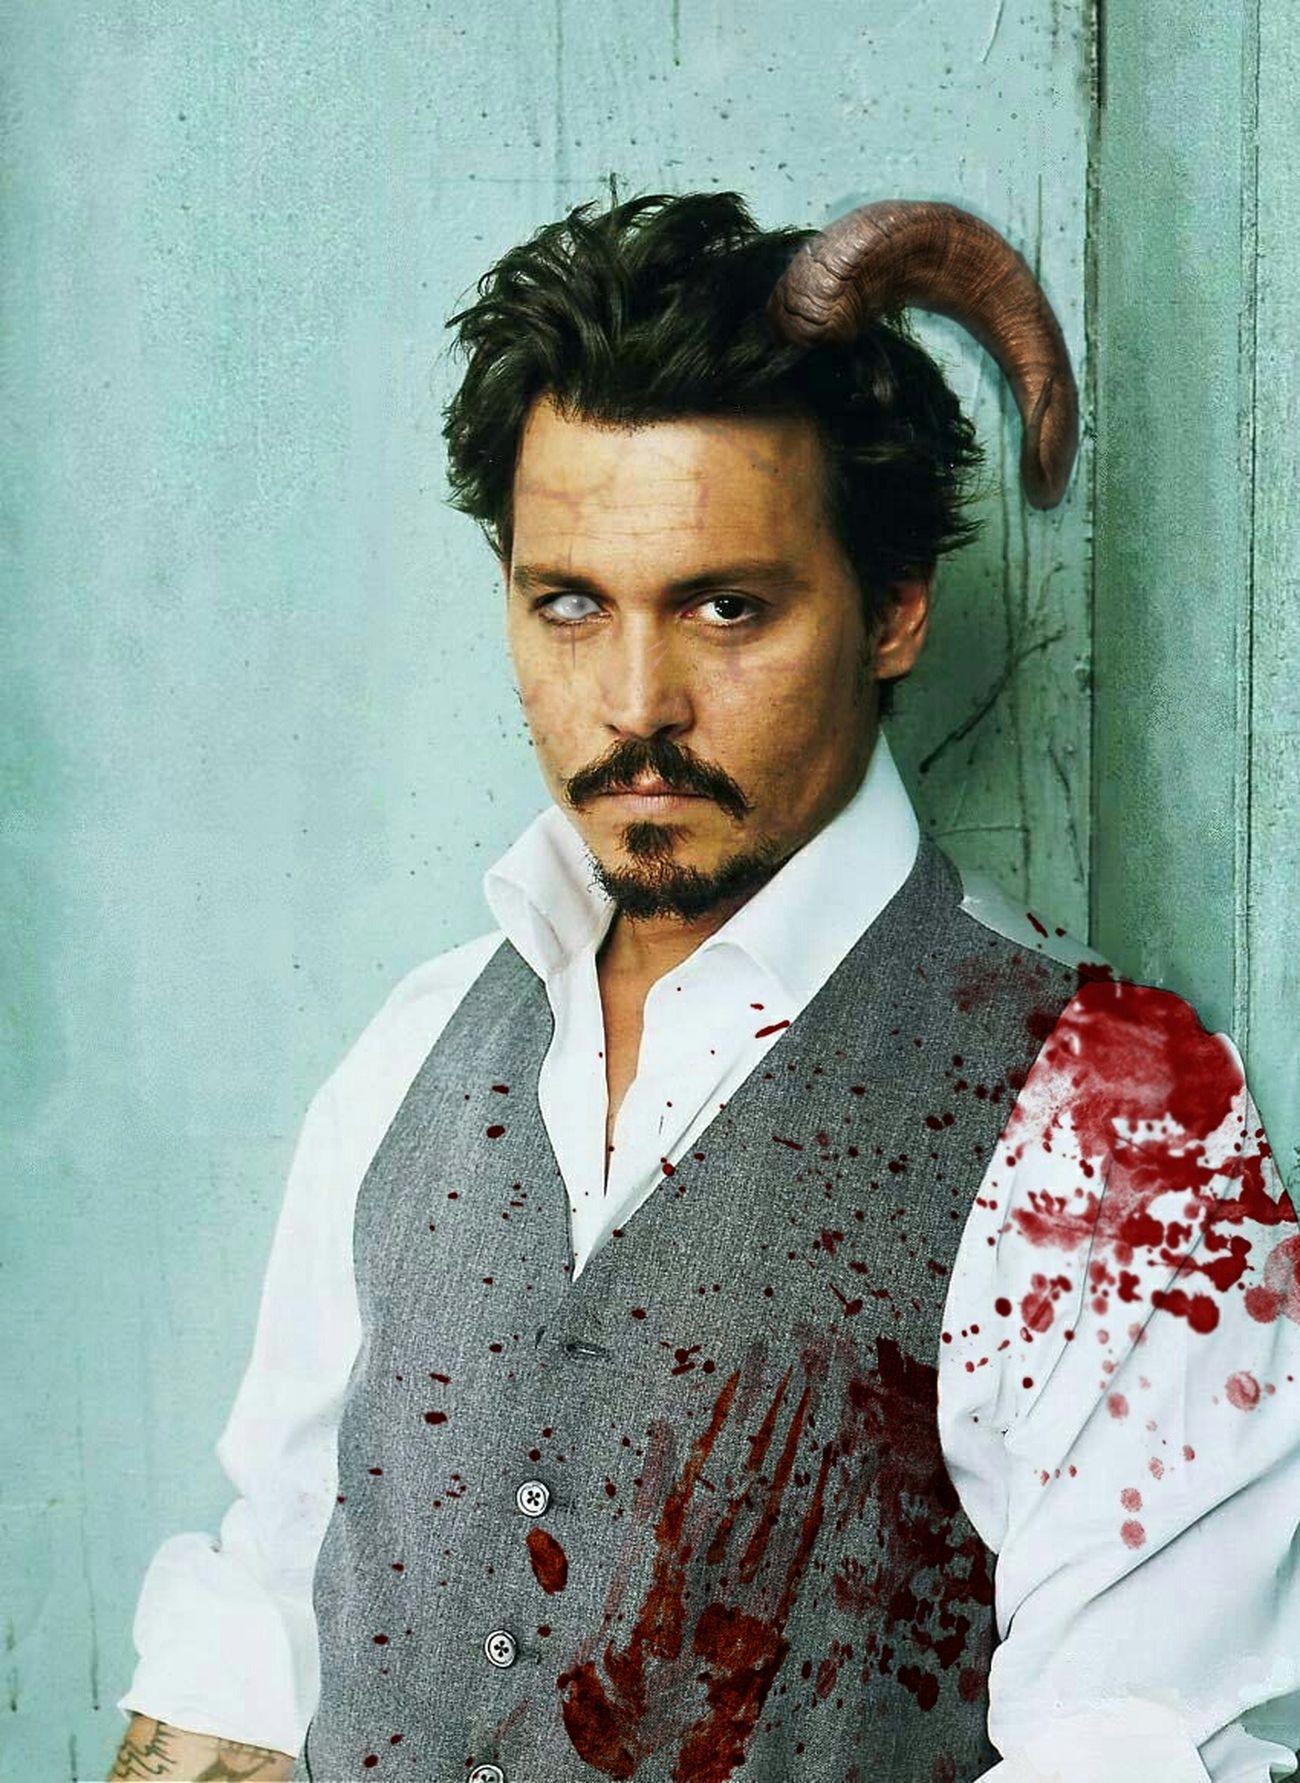 Photoshop of Johnny Depp. Johnnydepp Johnny Depp Depp Celebrity Photoshop Blood